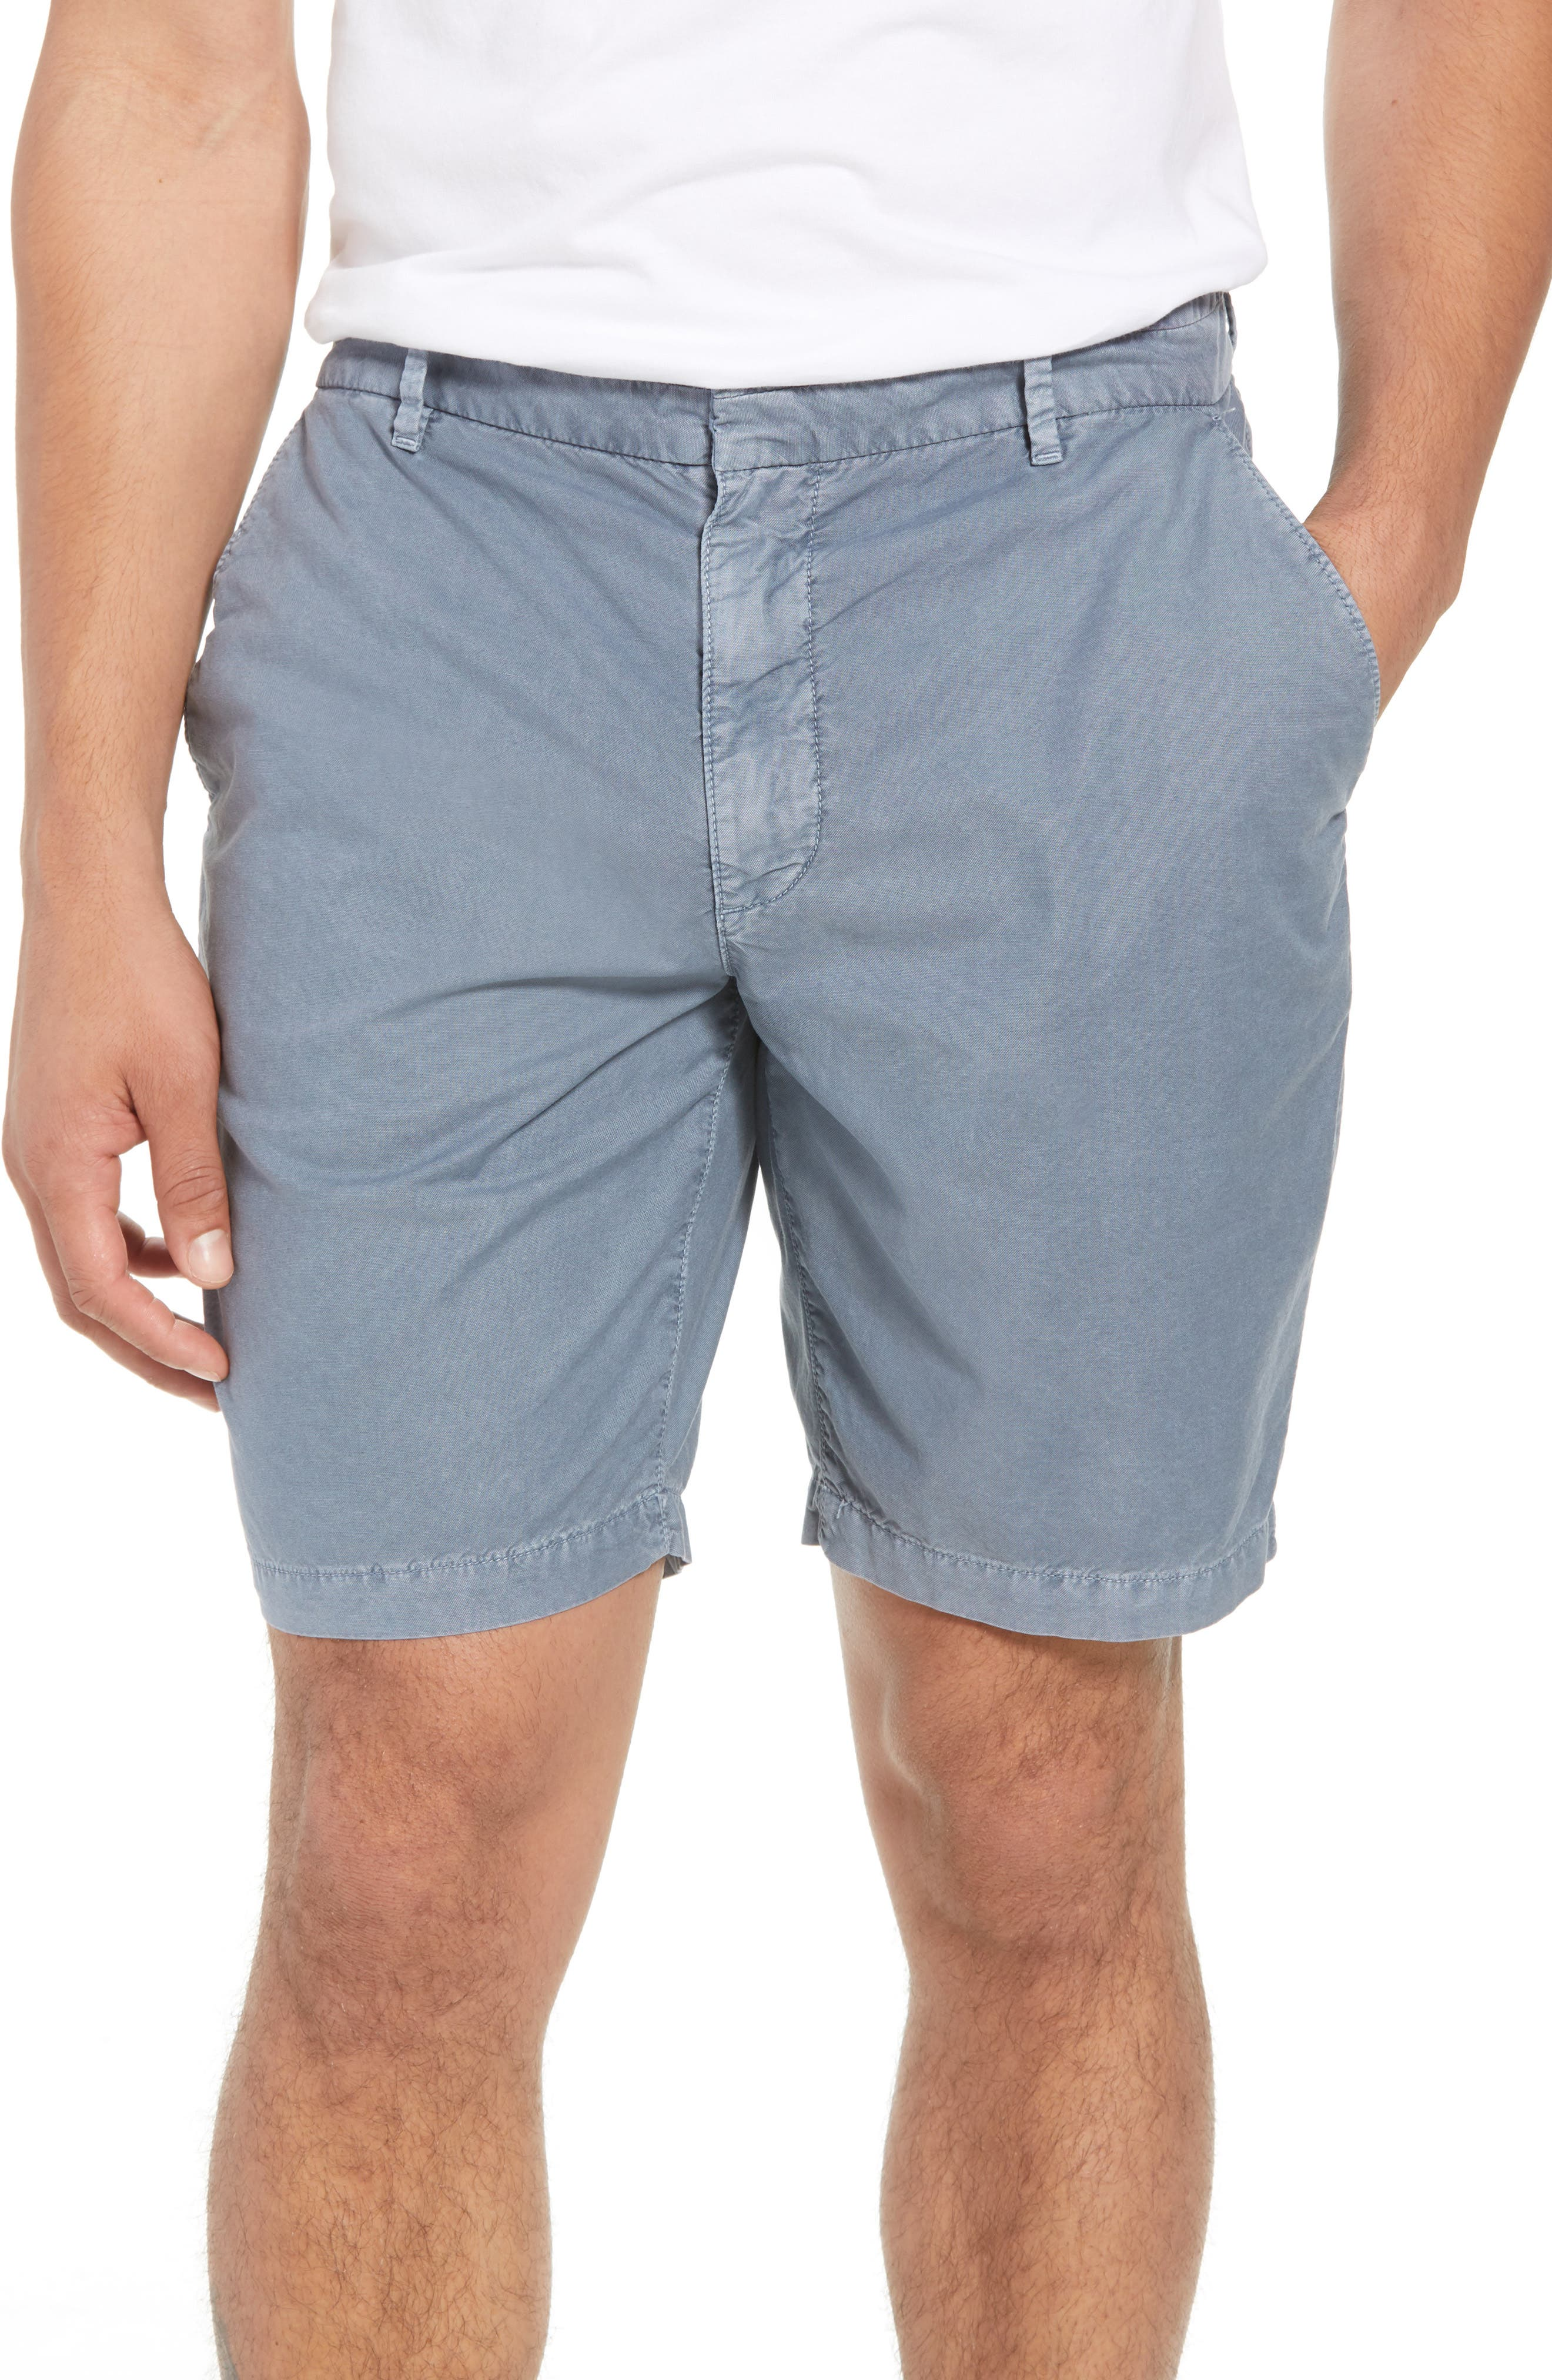 Butter Ball Shorts,                             Main thumbnail 1, color,                             BLUE SLATE